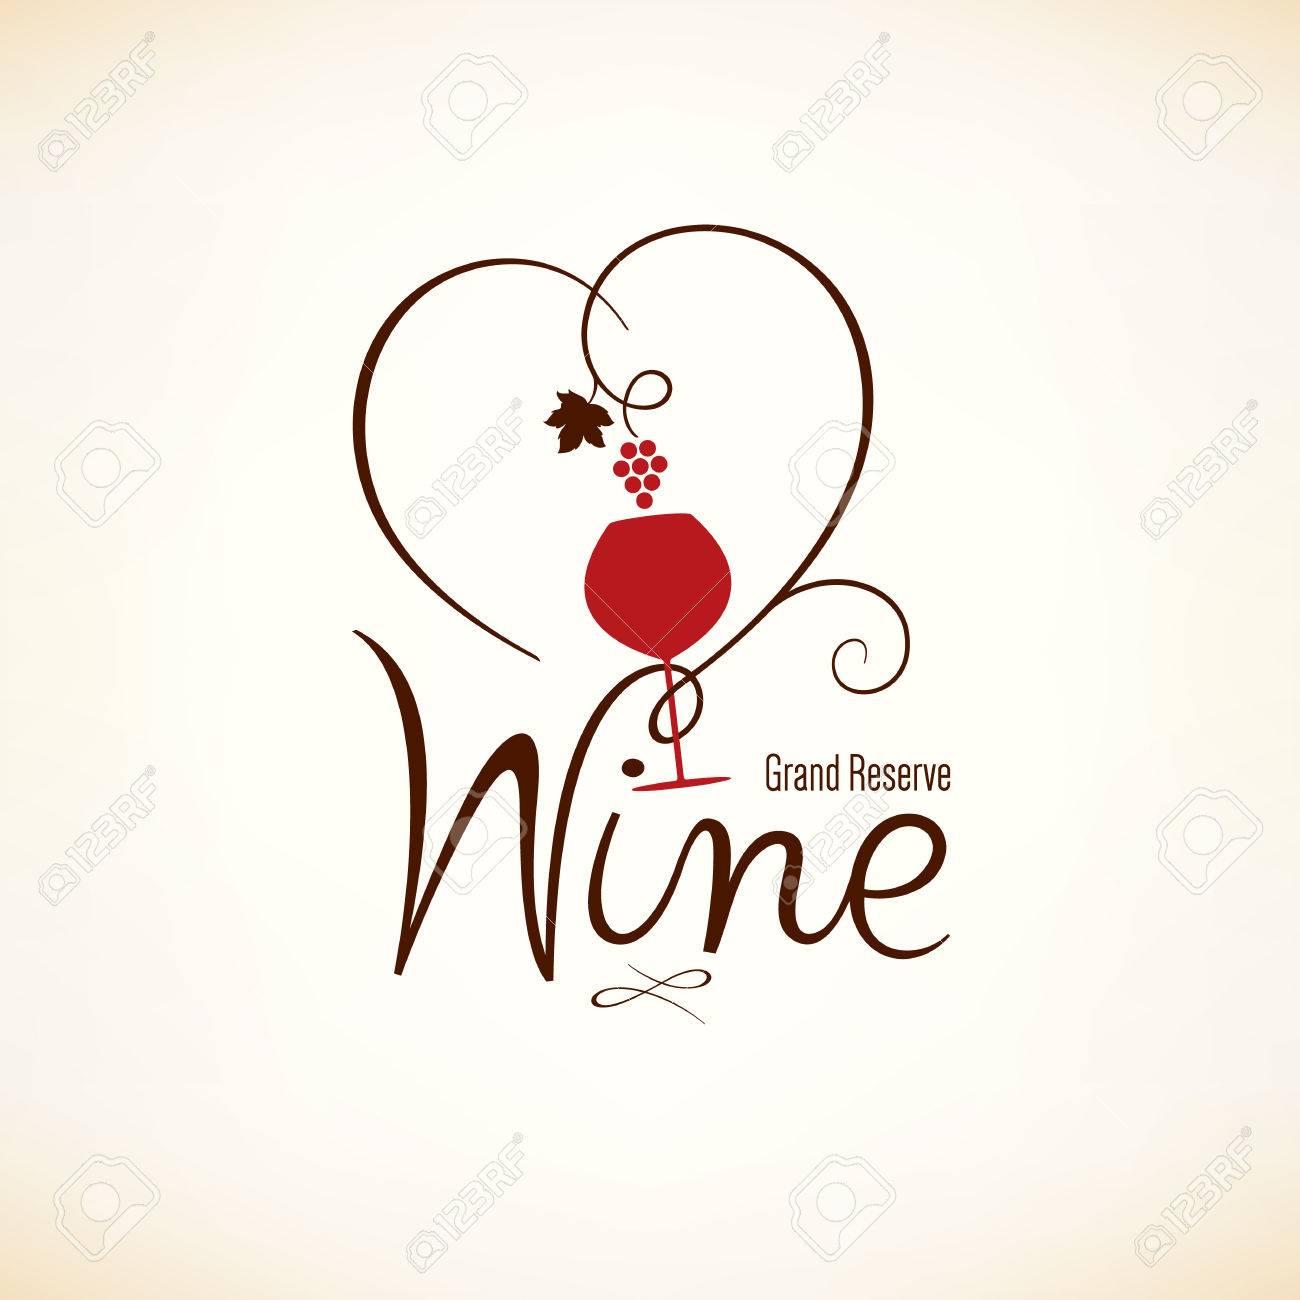 Wine list design - 36154378